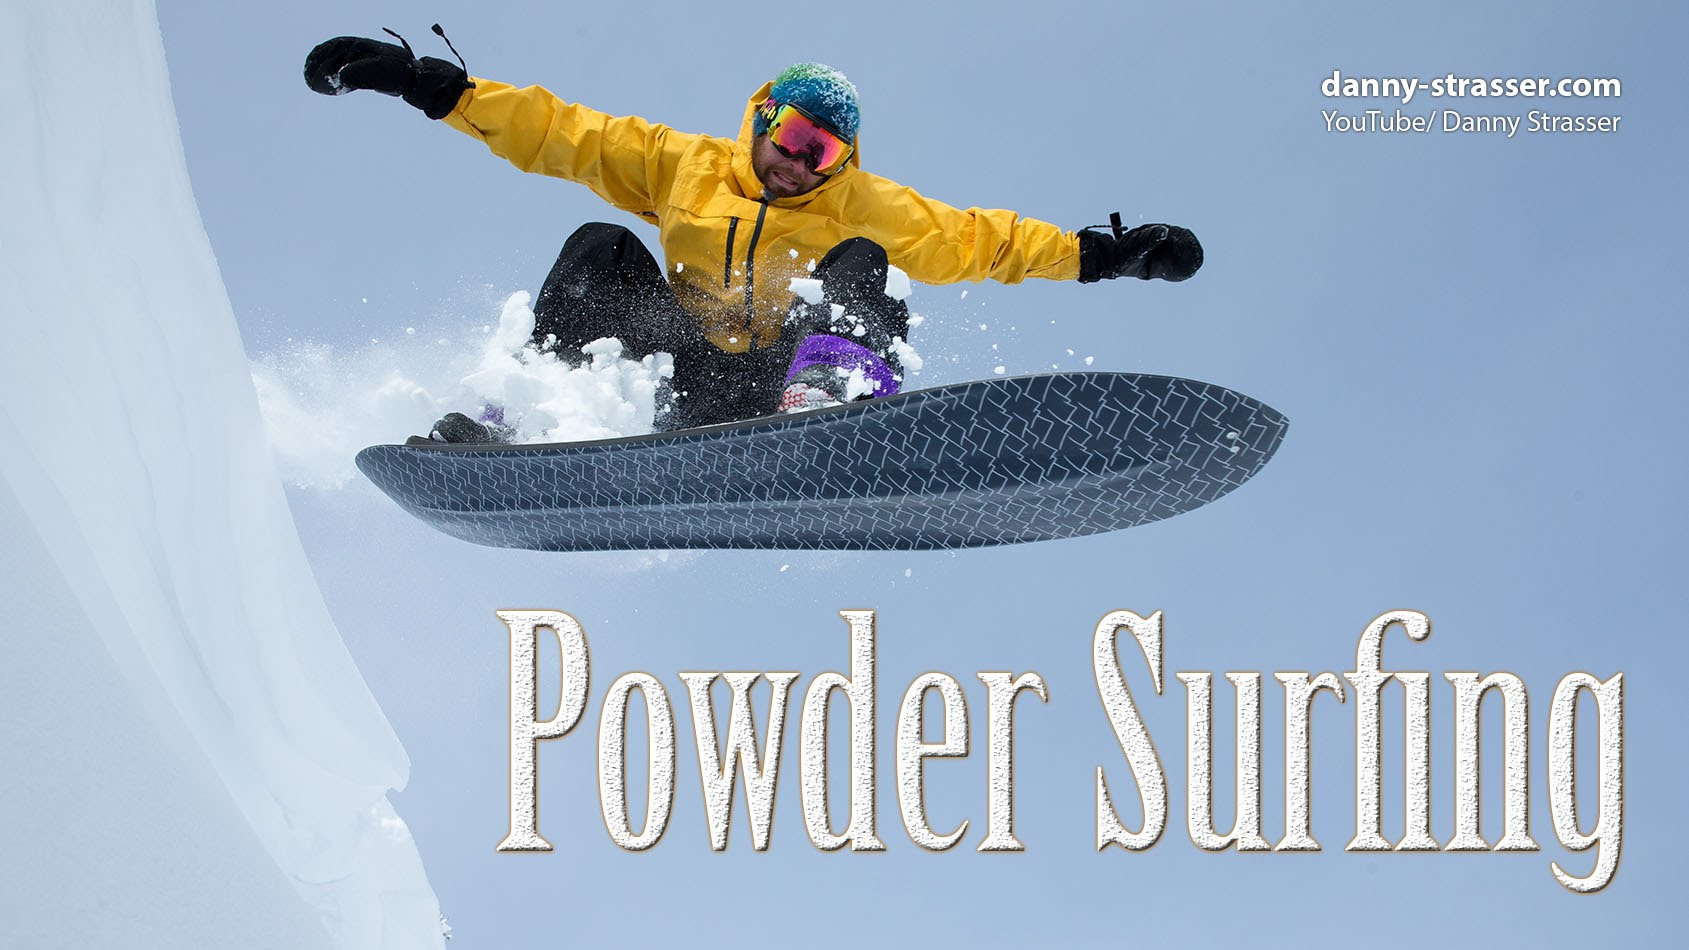 Pogo Asueto Powdersurfing